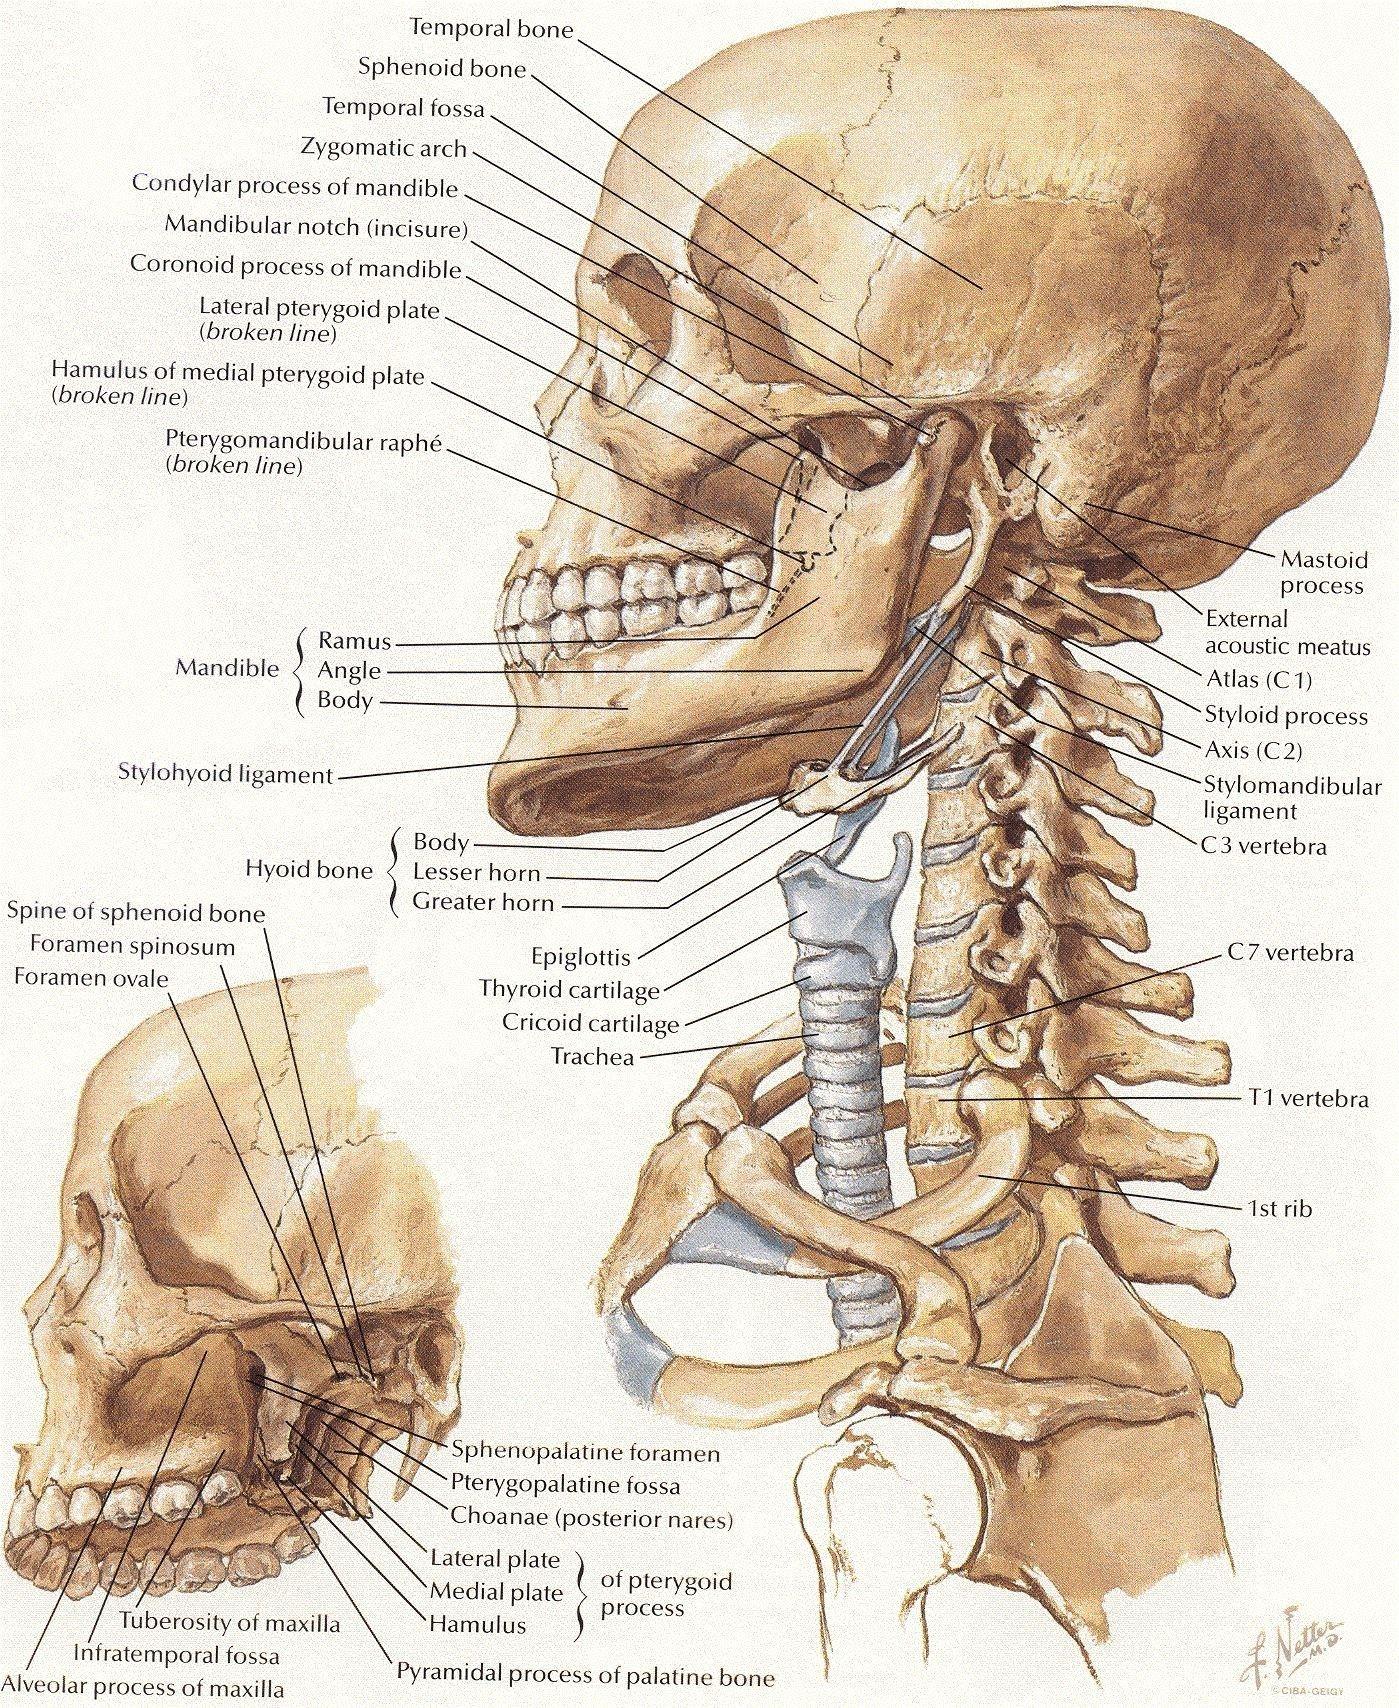 hight resolution of mastoid bone picture mastoid bone picture netter 009 head neck bones medical pinterest